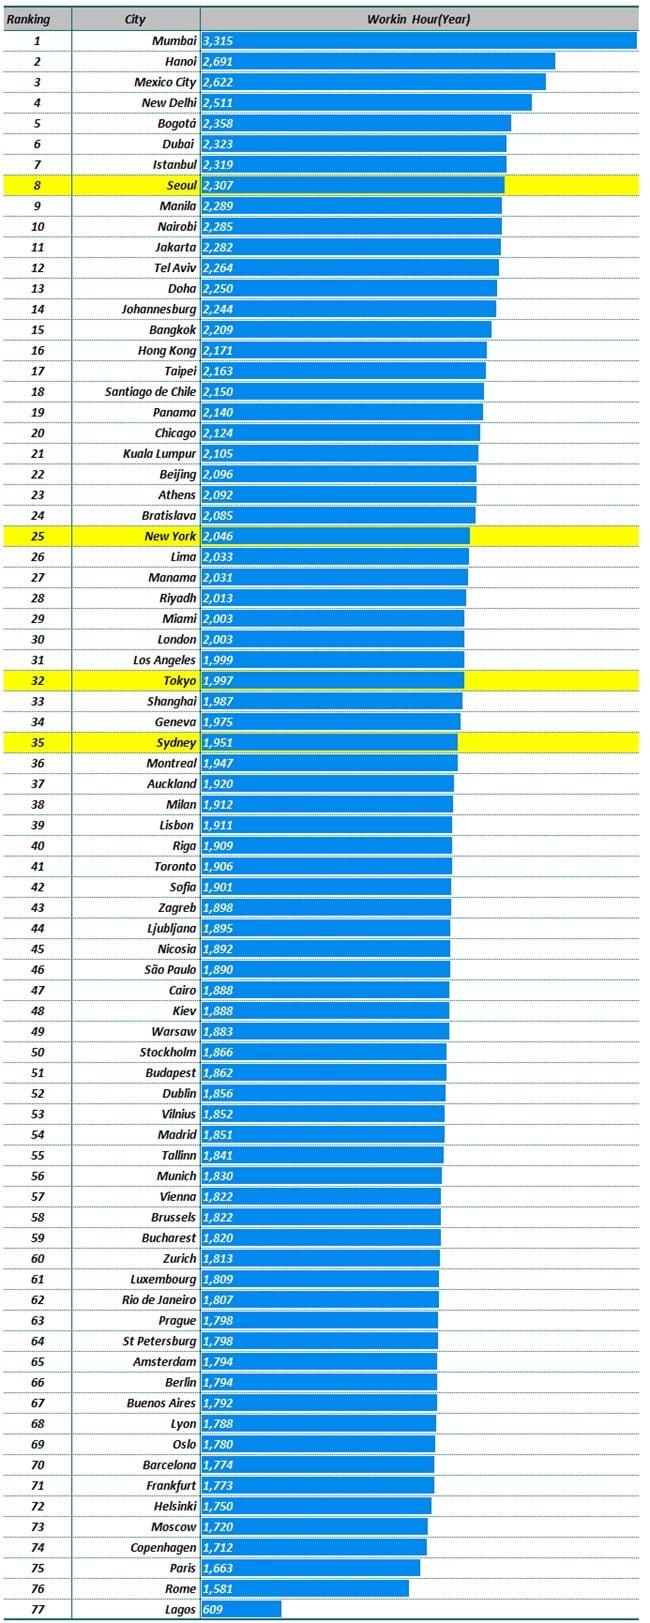 UBS 조사 도시별 연간 근로시간(유급 휴가 포함) UBS 자료 기반 그래프 by Happist